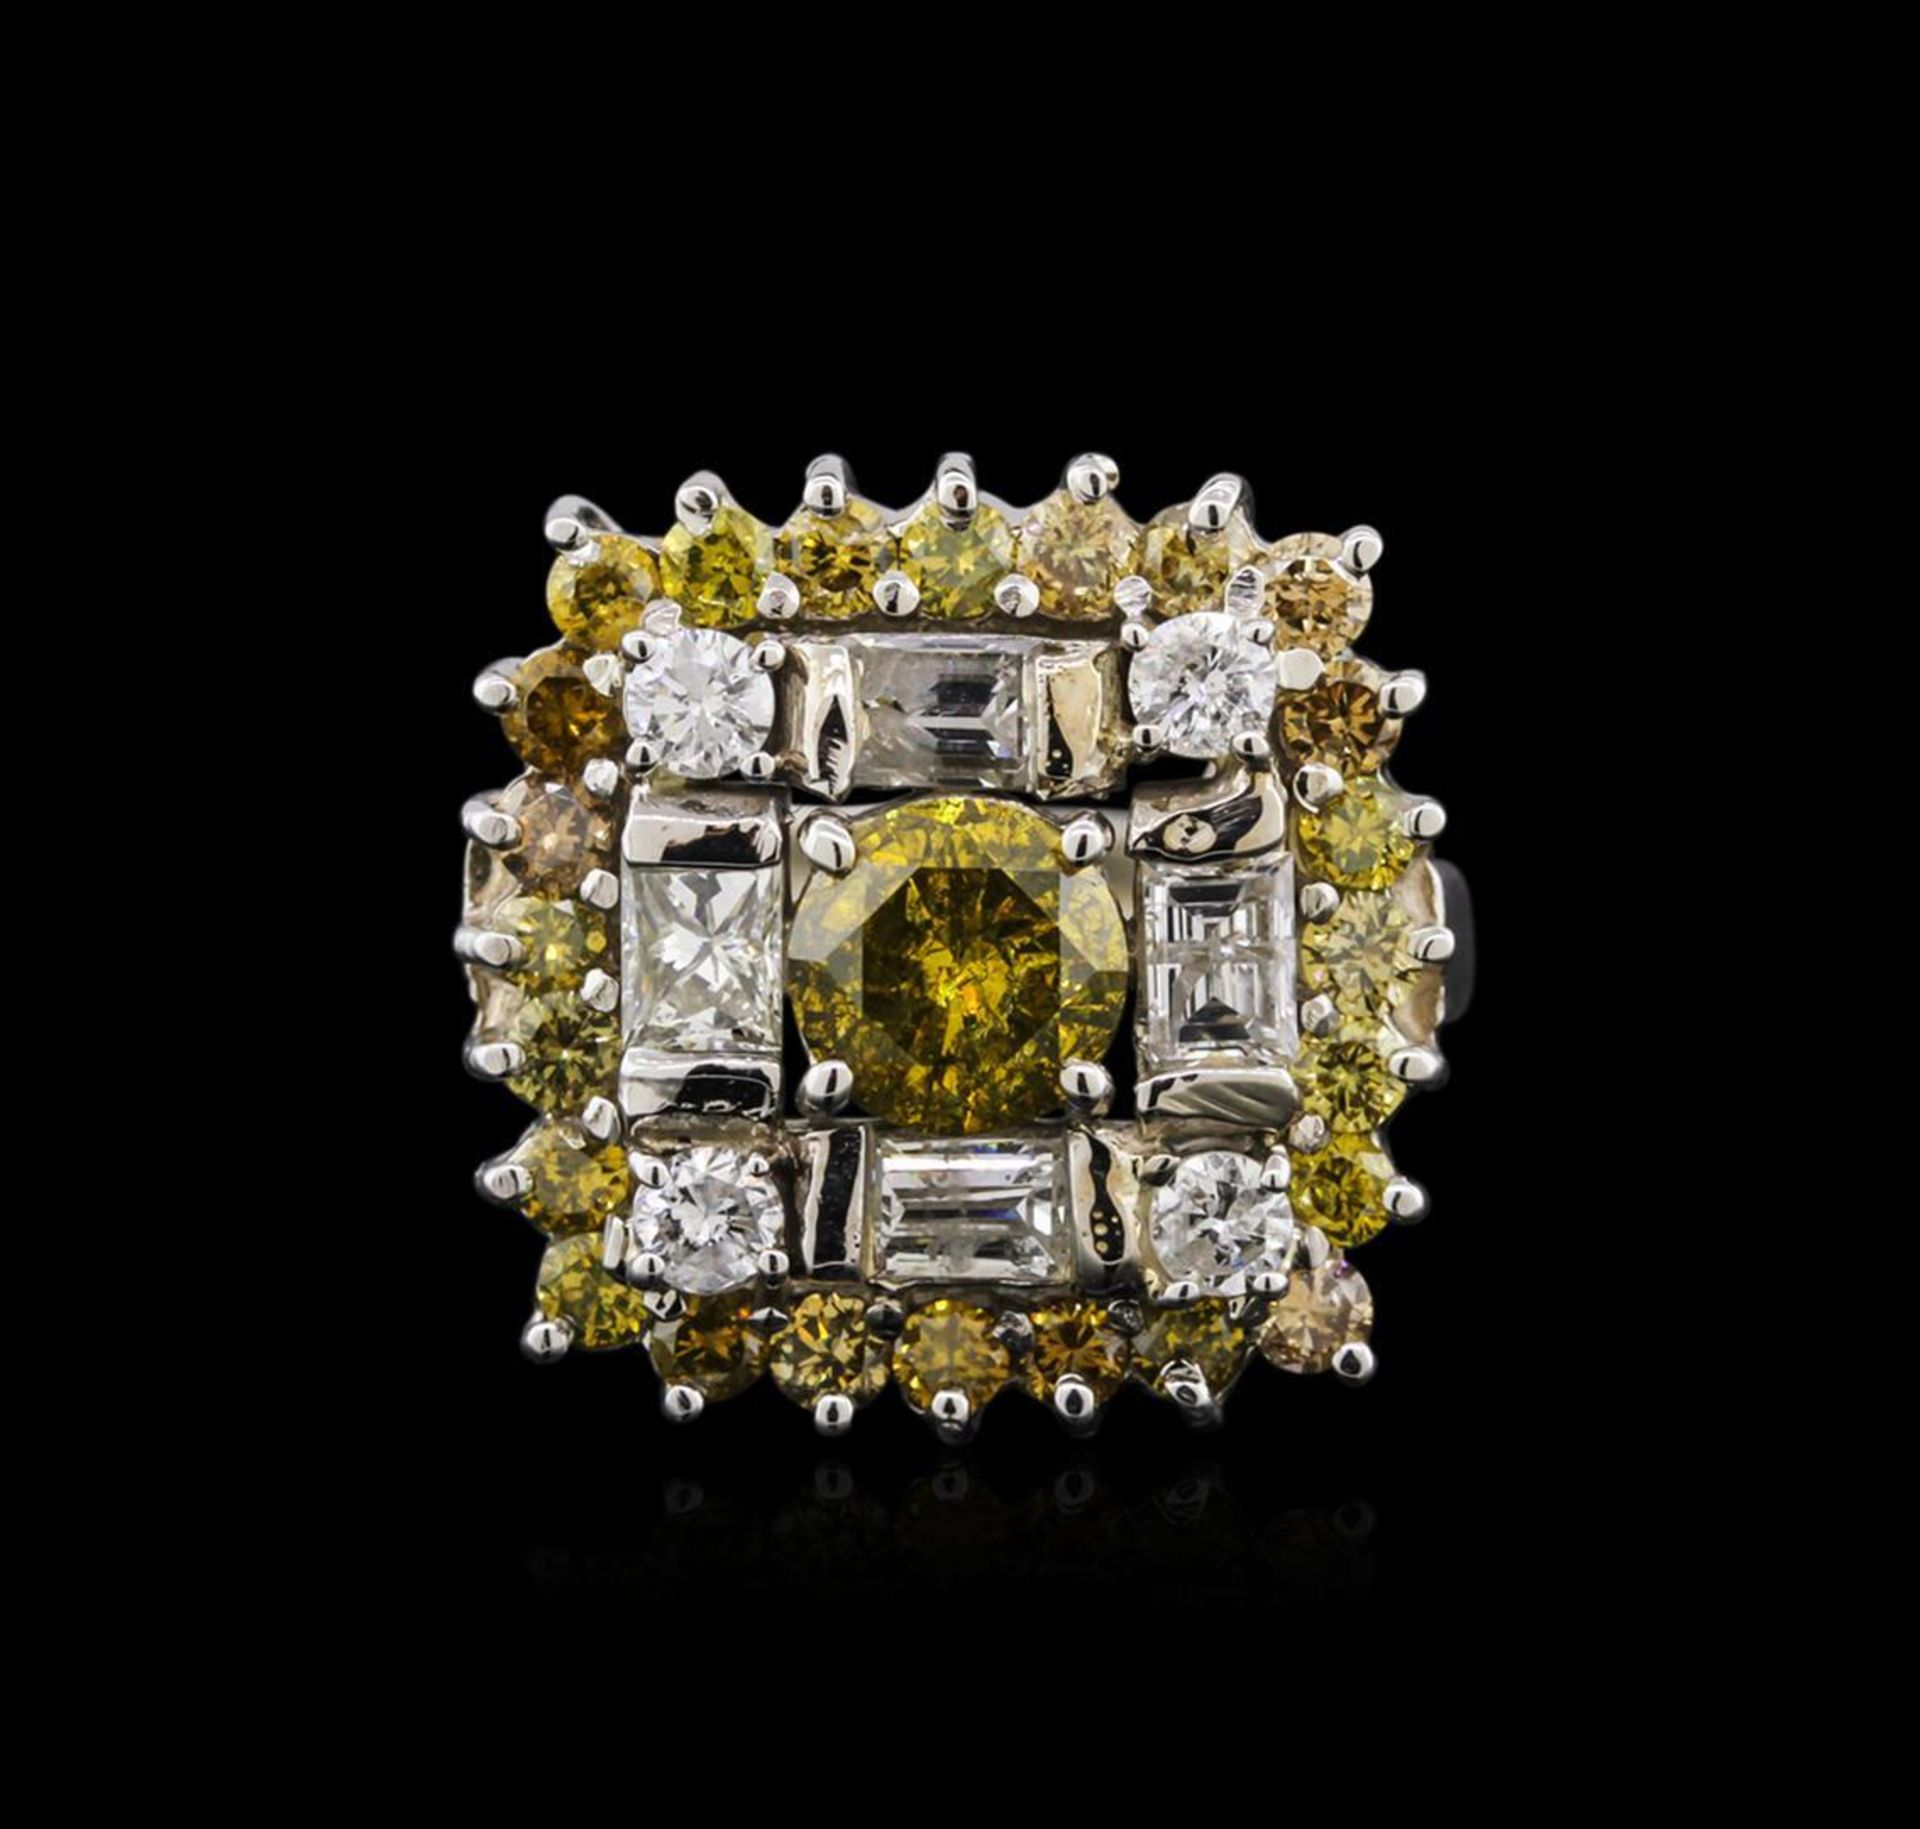 14KT White Gold 2.93 ctw Diamond Ring - Image 2 of 4